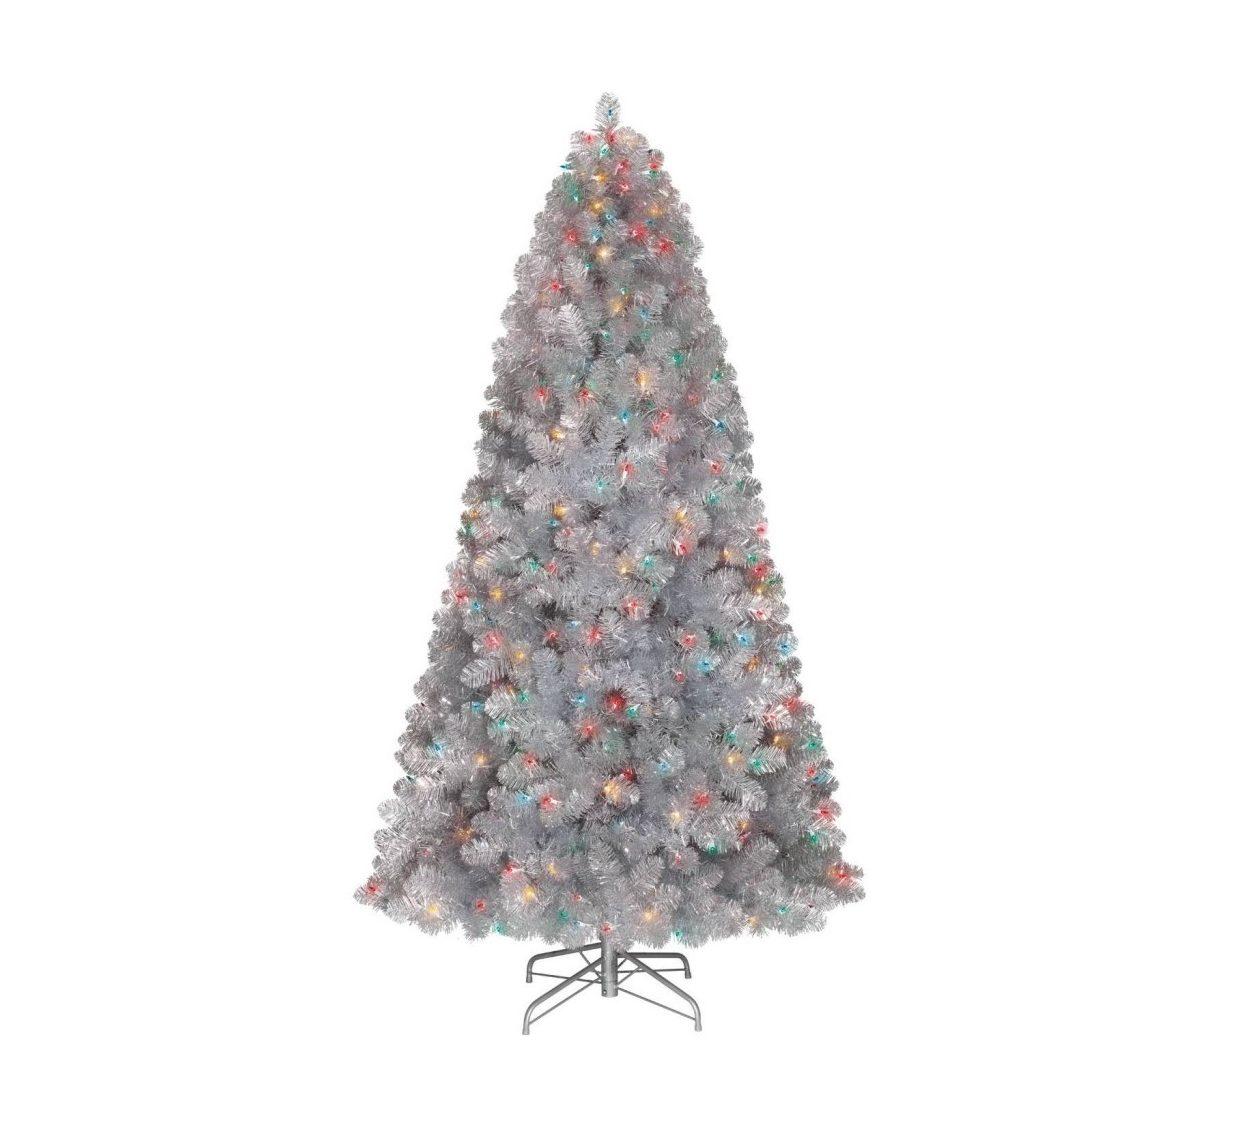 7 retro christmas trees and wreaths to celebrate the season - Retro Christmas Trees